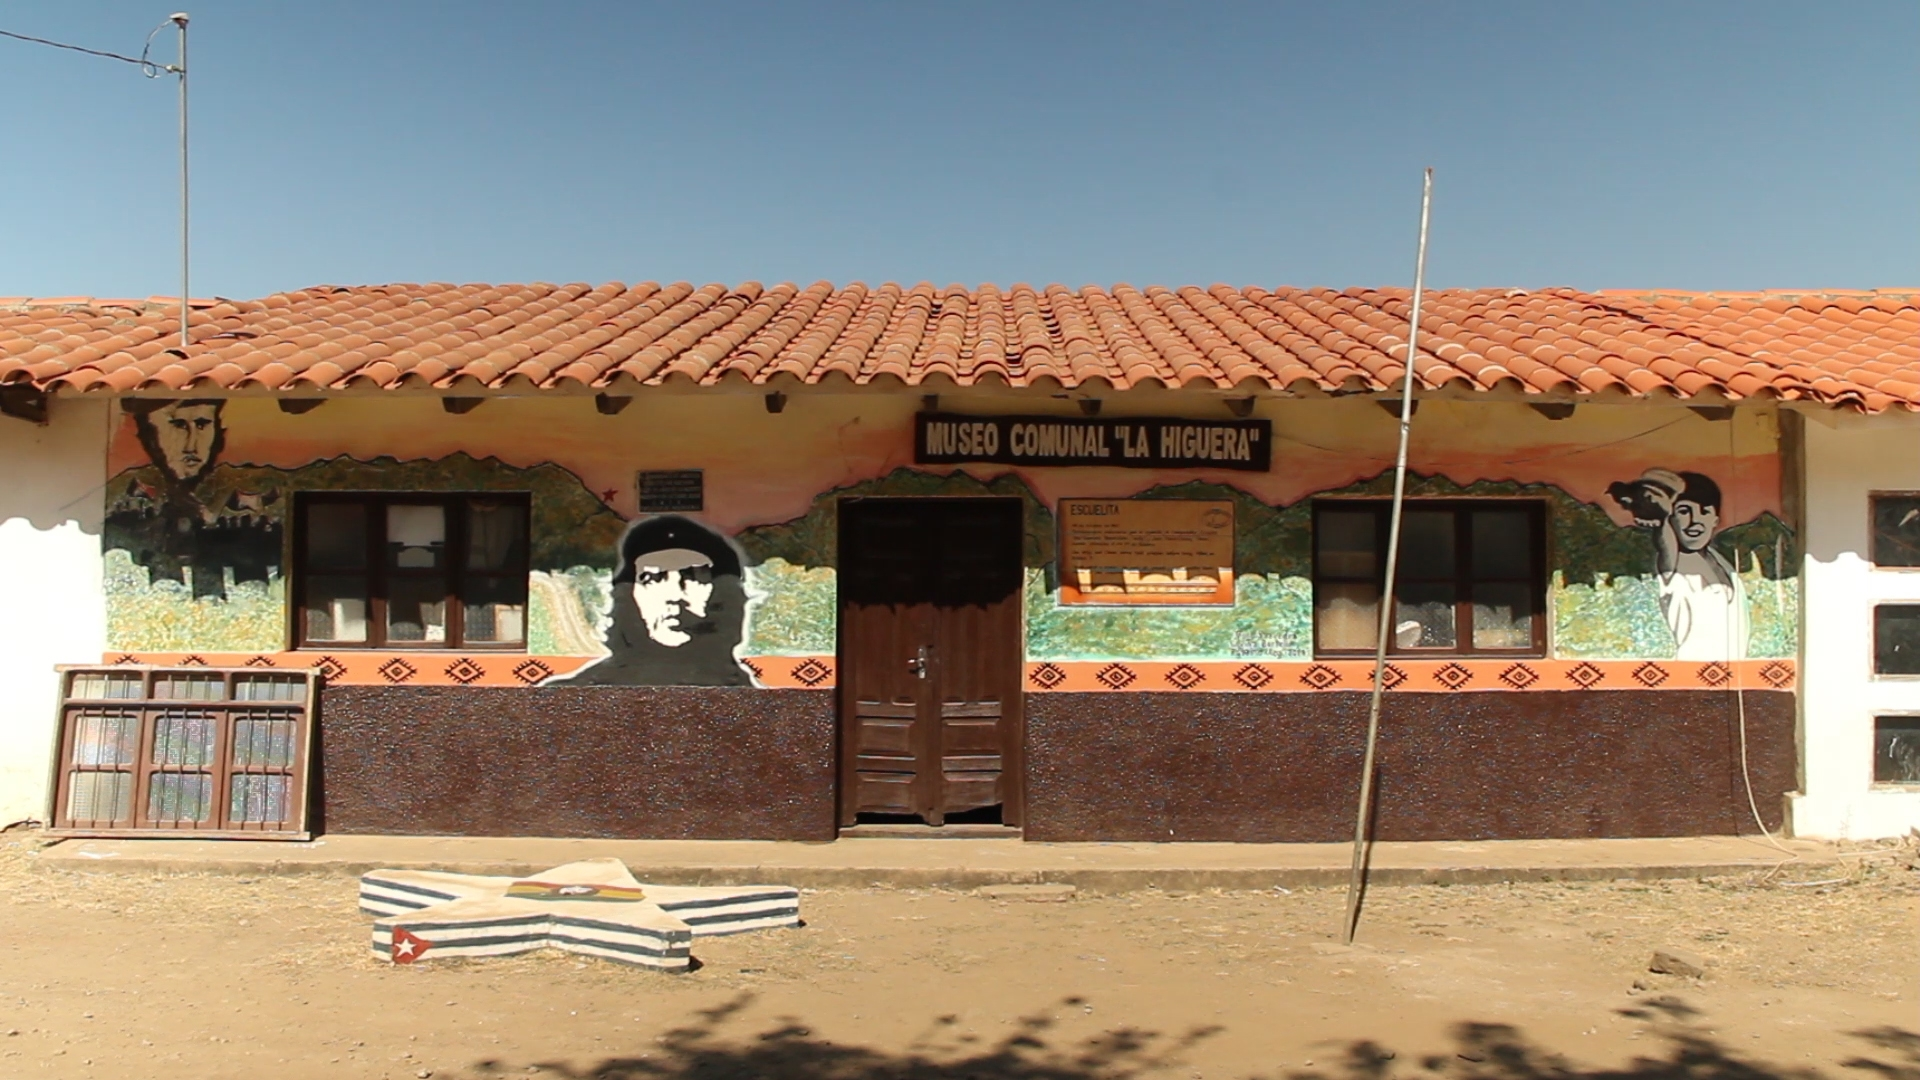 escuela higuera pablocaminante 1 - Ruta del Che 2/2, La Higuera